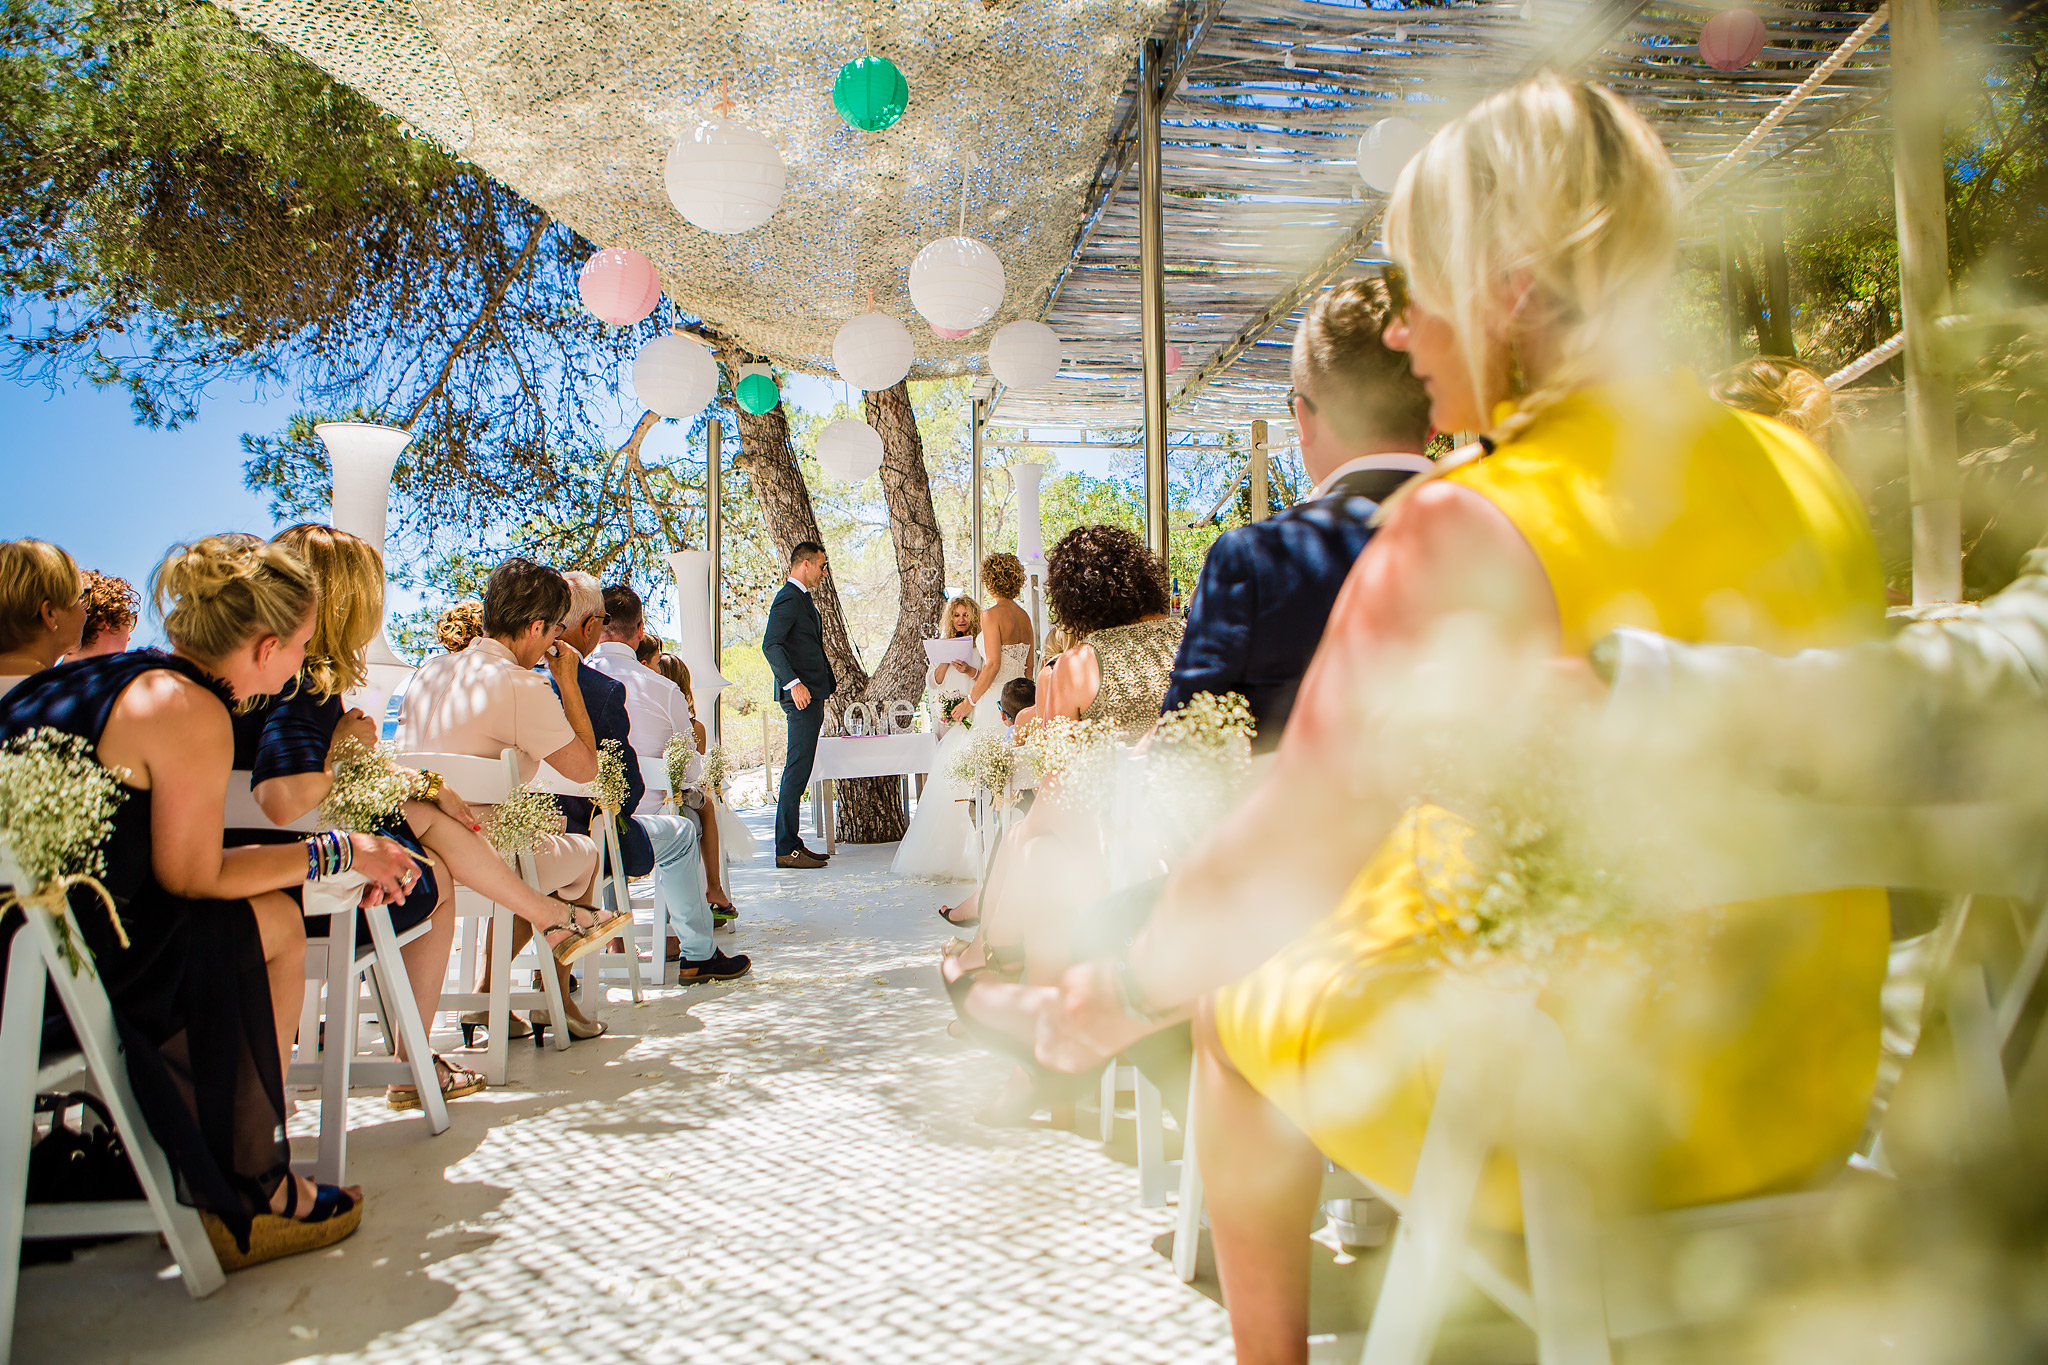 Bruidsreportage Destination Wedding Ibiza Mandy en Joost 013 - Bas Driessen Fotografie